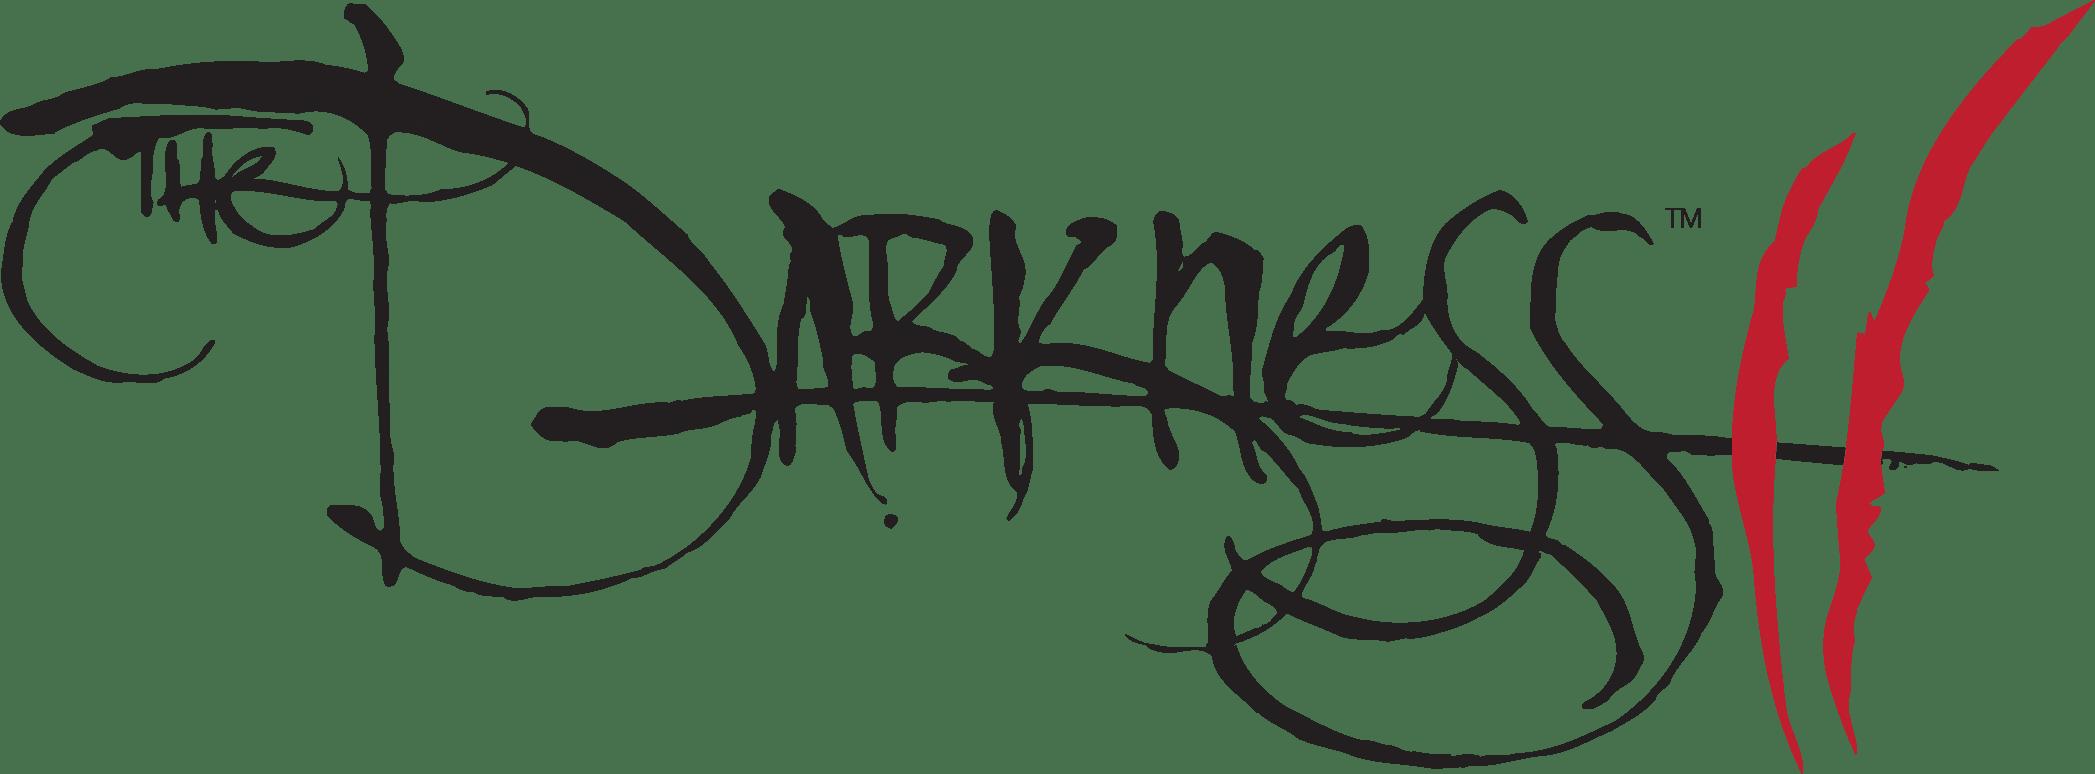 E3 Darkness 2 Preview